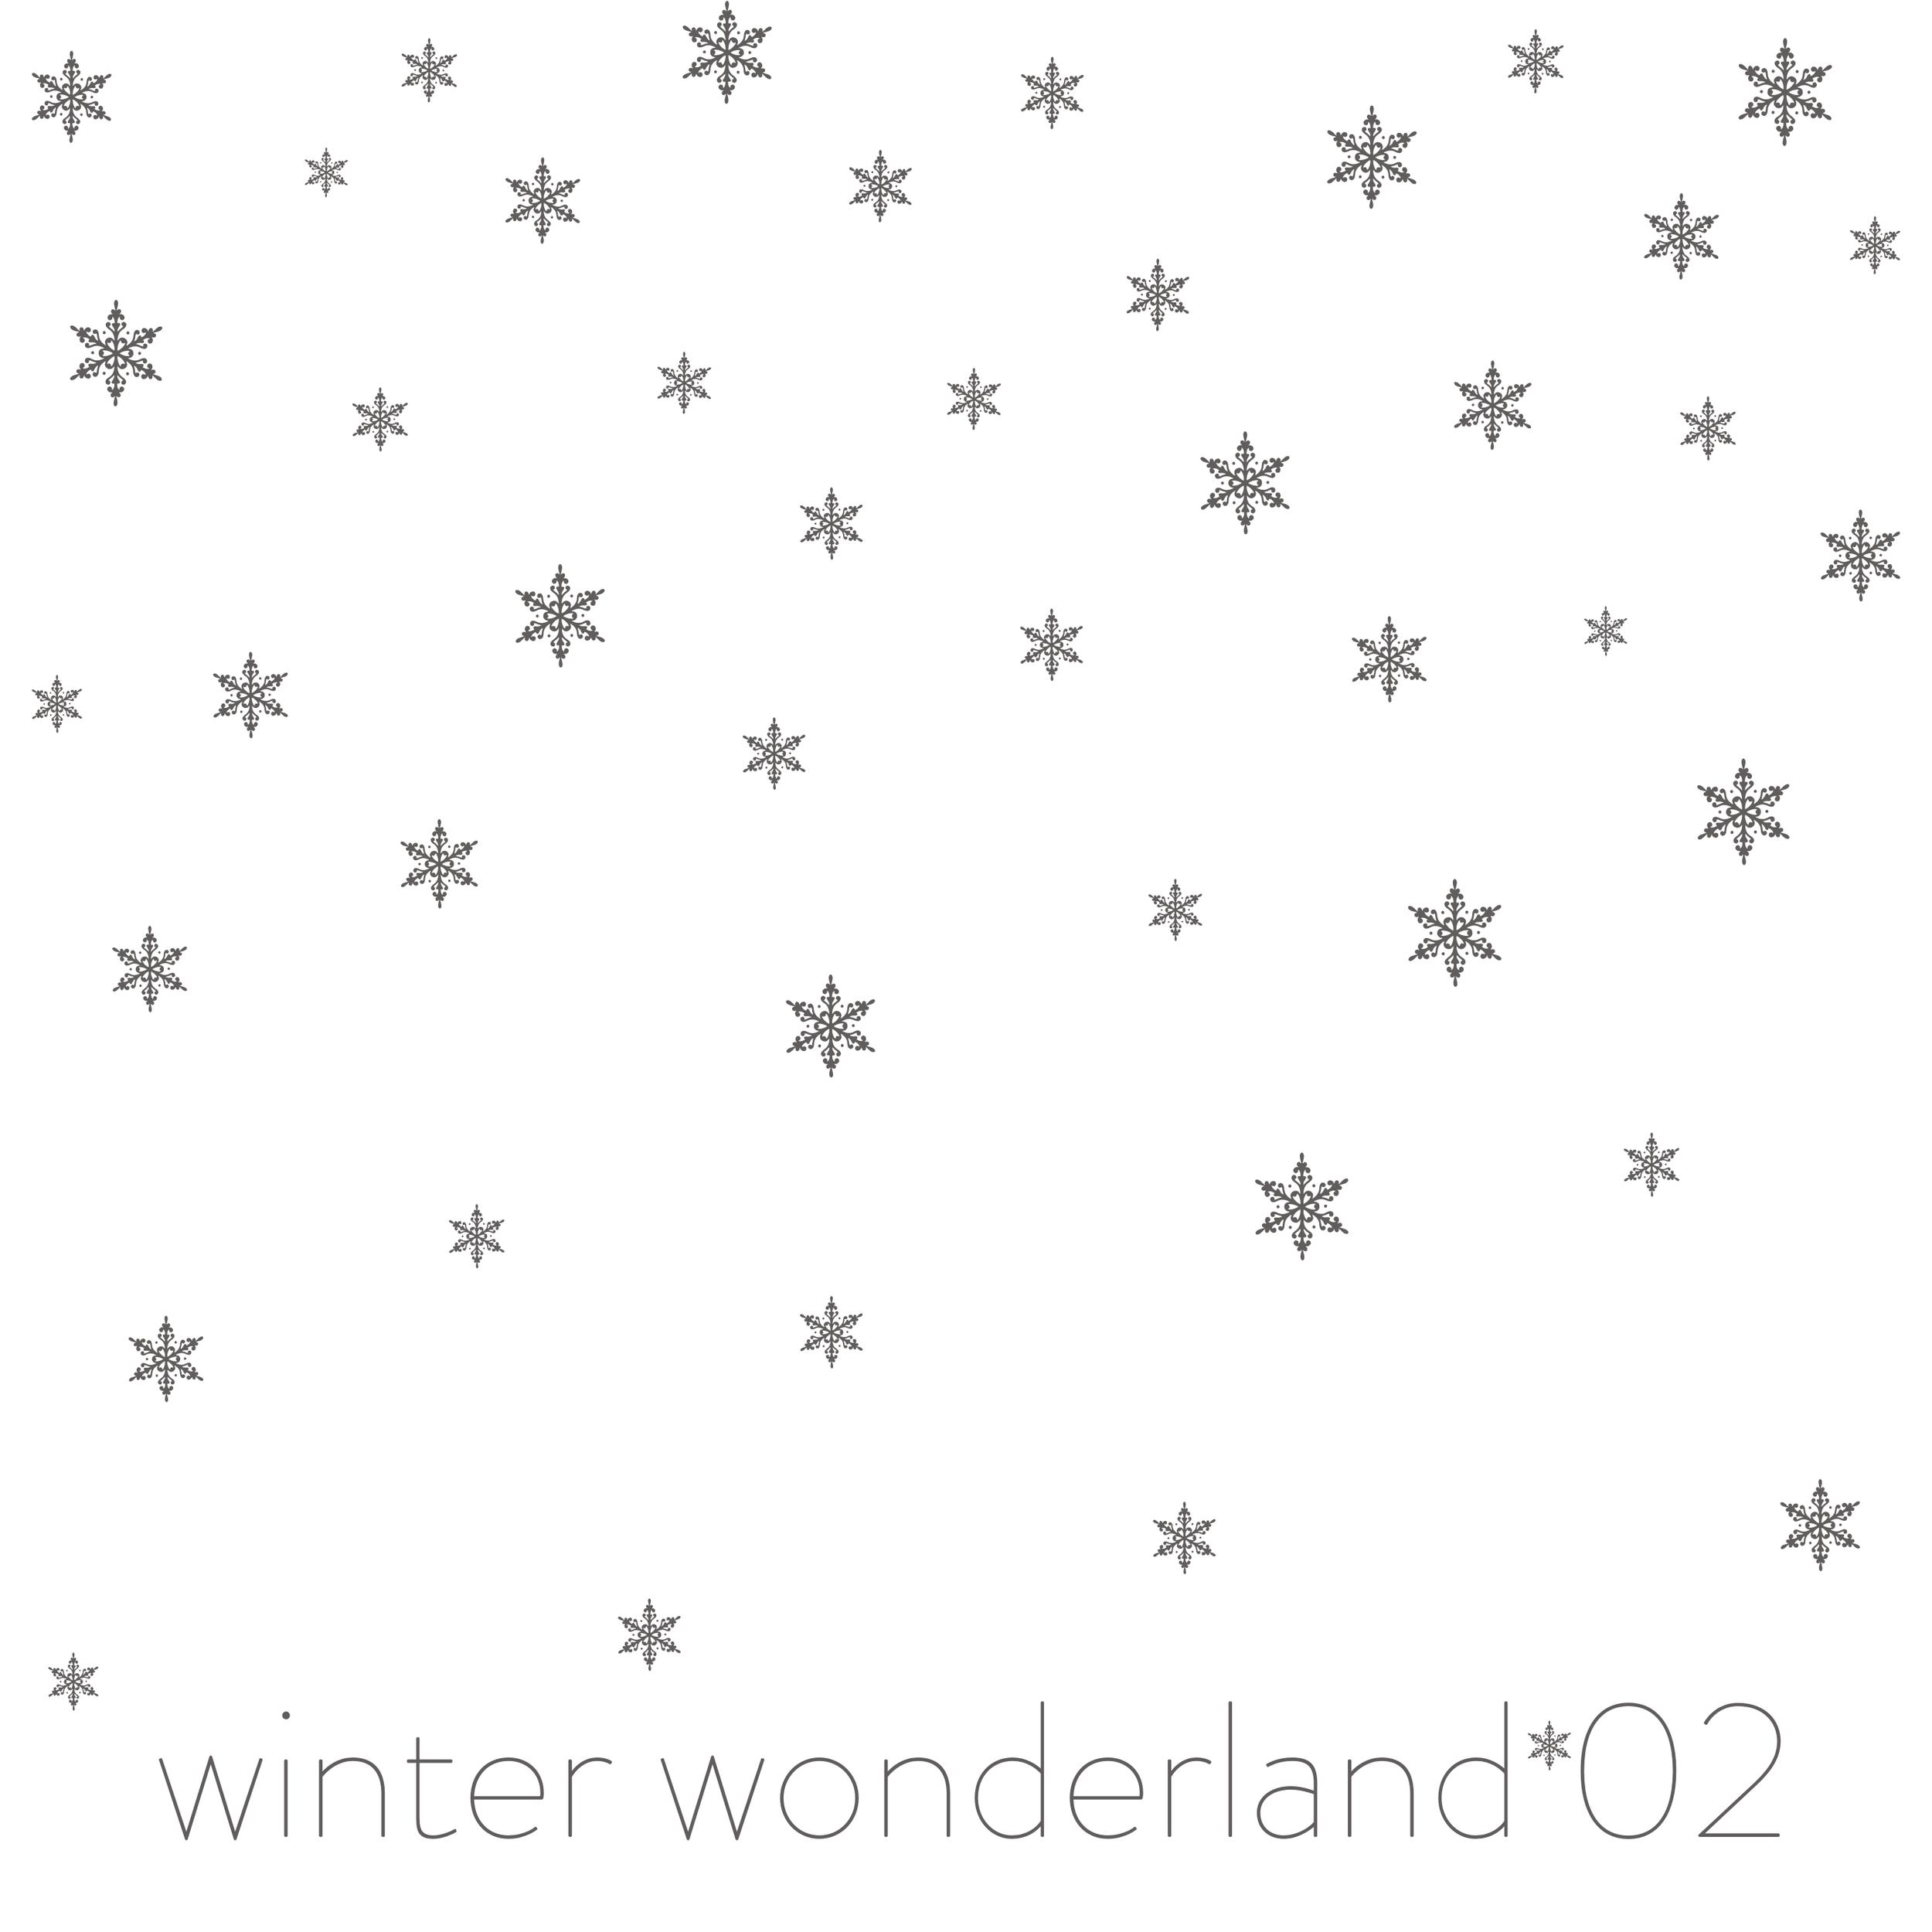 winter wonderland 02.png